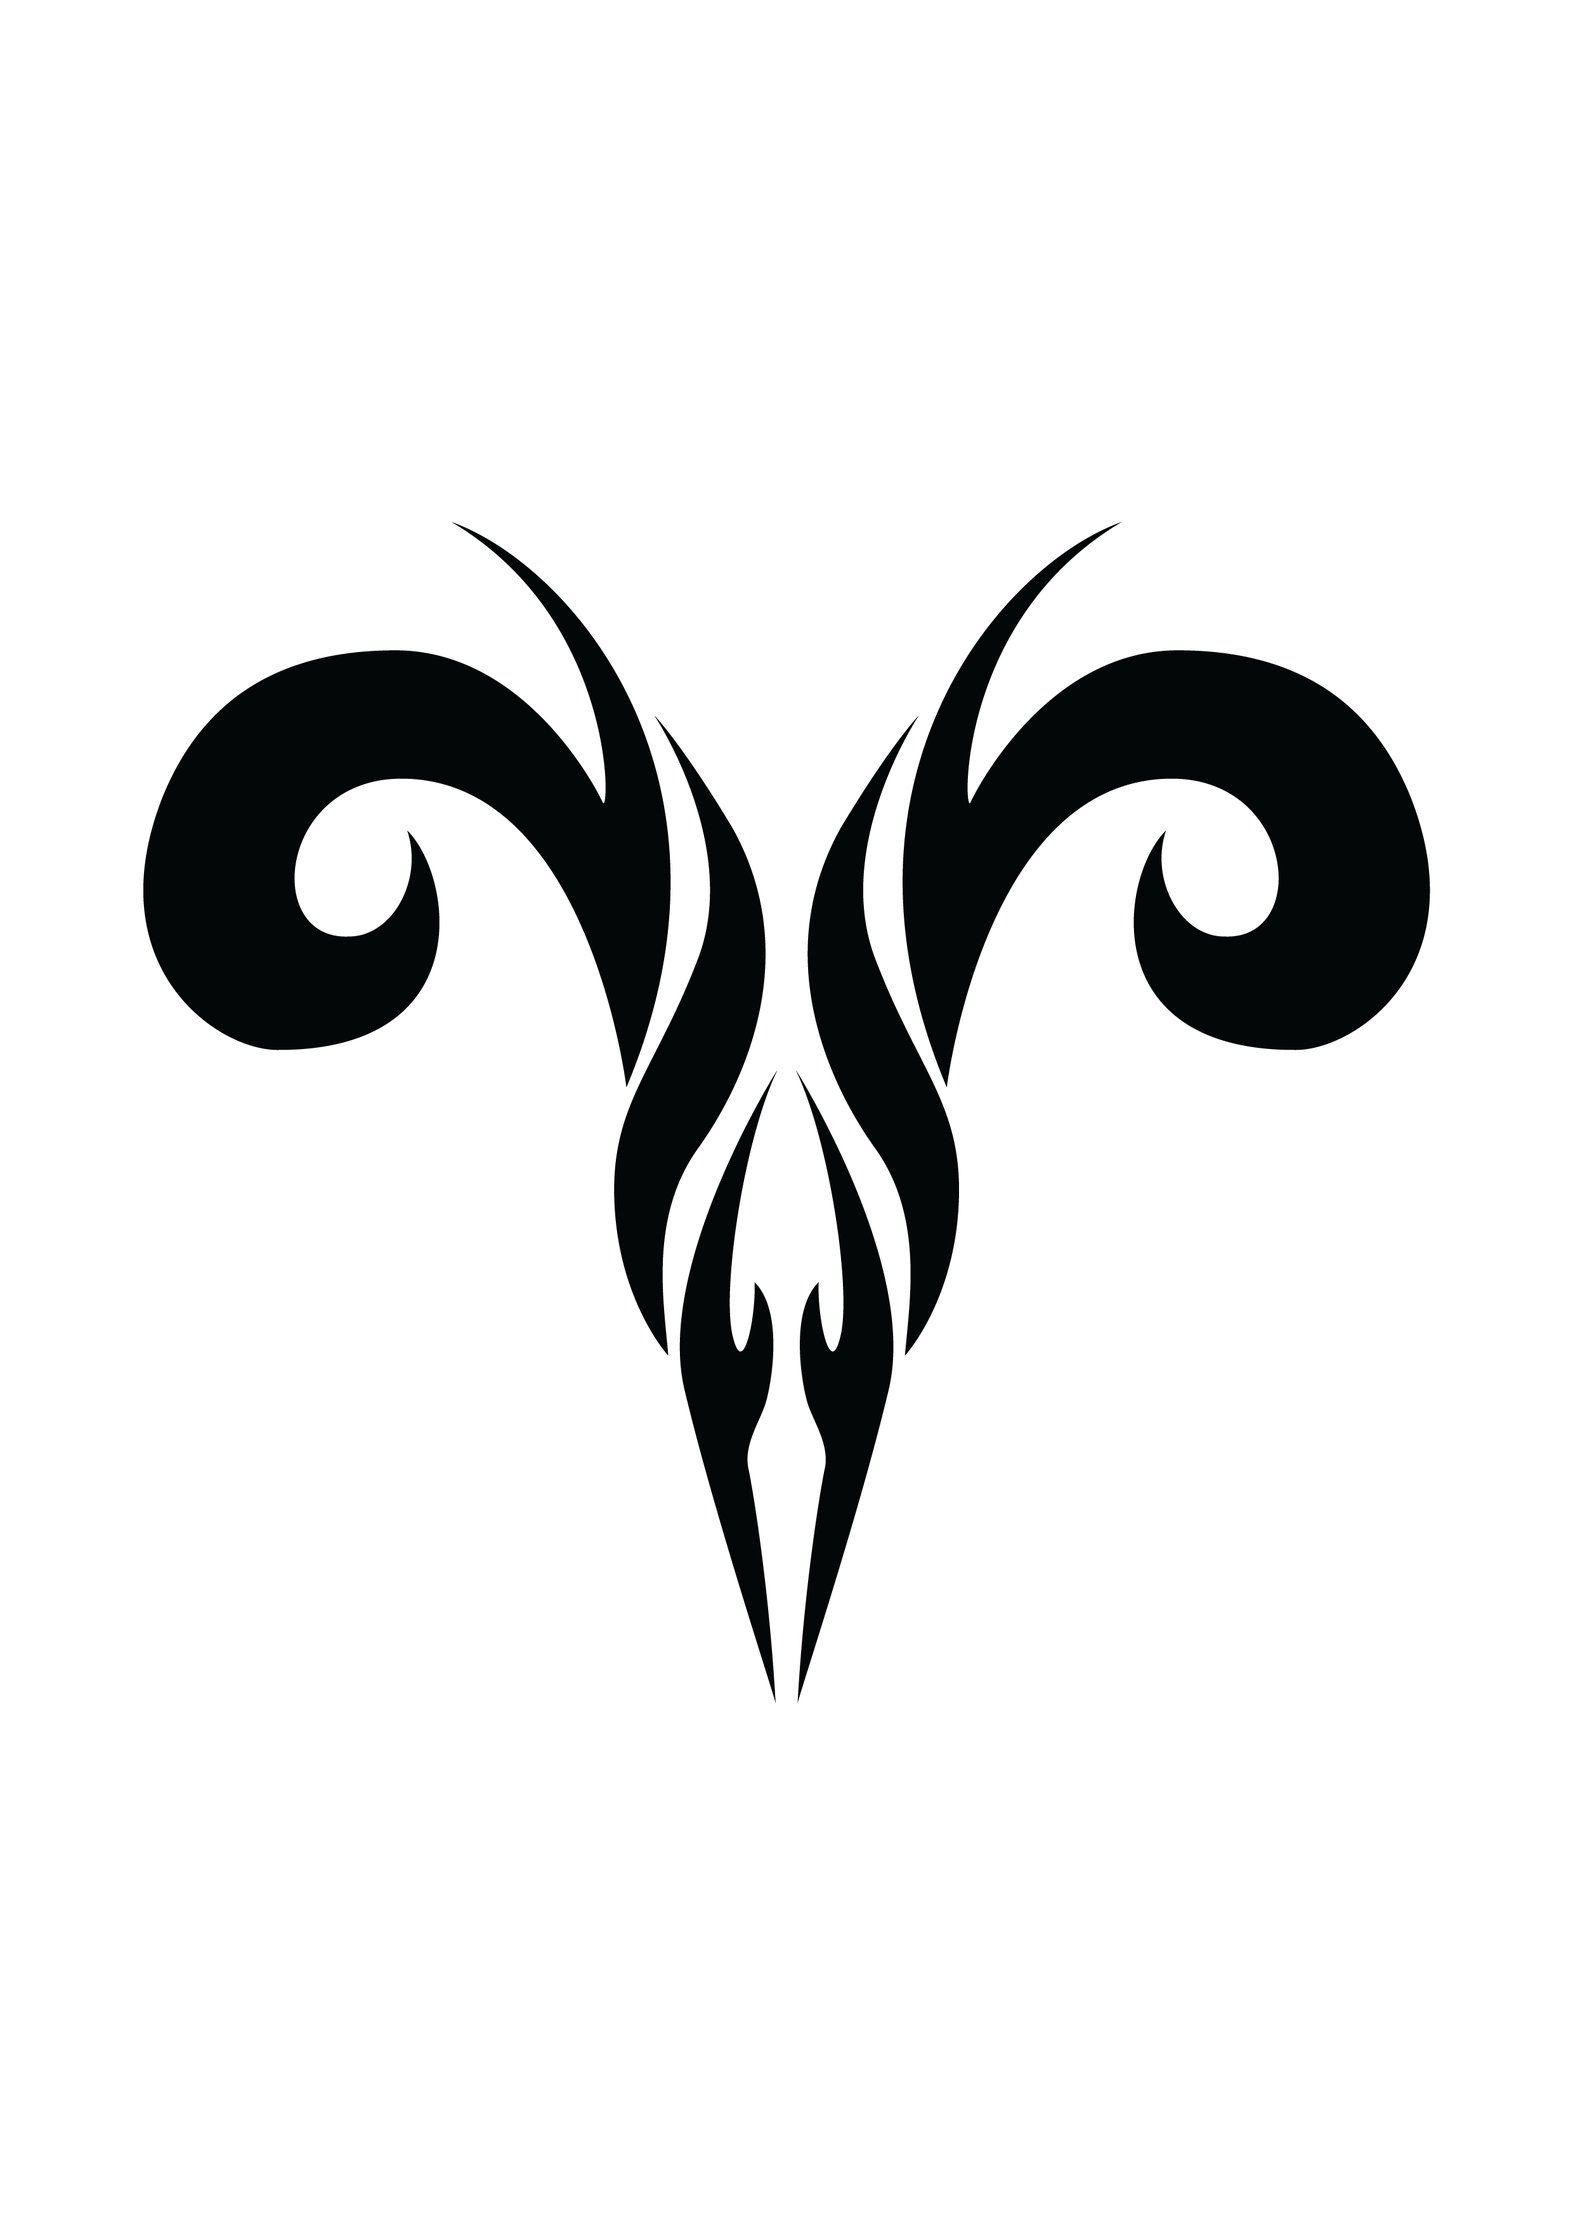 I Take Aries My Zodiac 1 And Taurus Zodiac 2 And Make Tauries